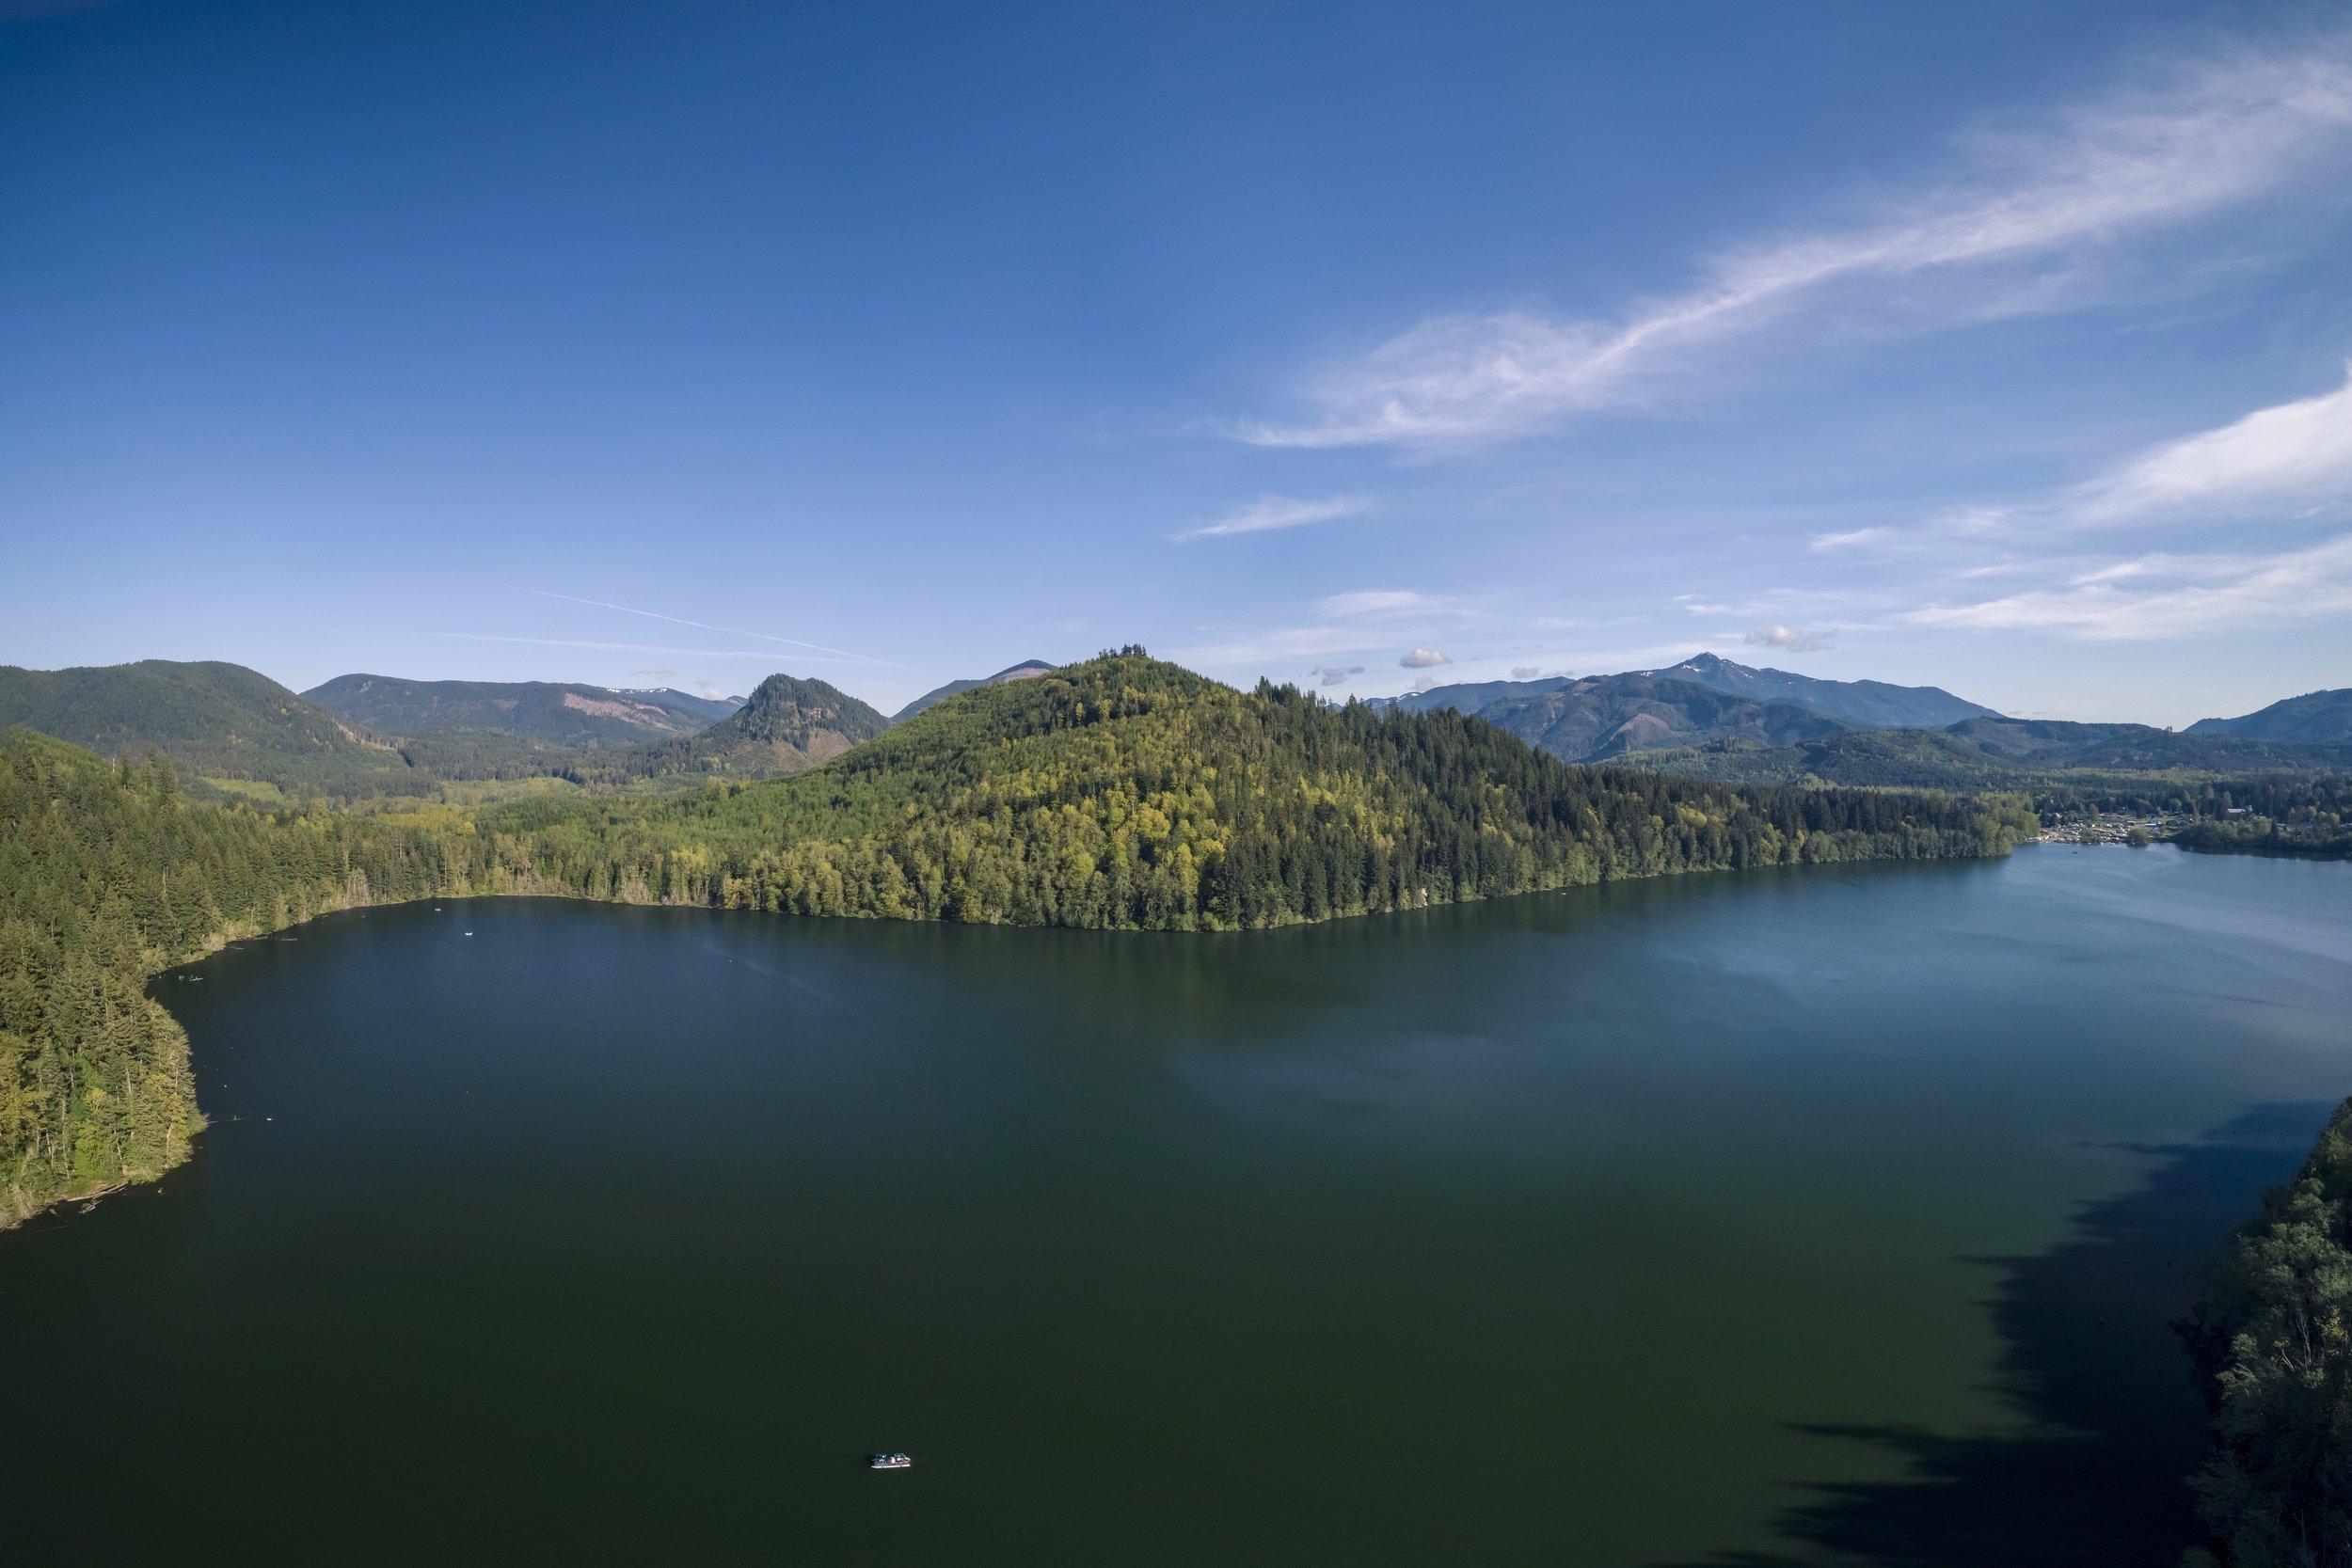 Mineral_Lake_Pacific_Northwest_High_Angle.jpg